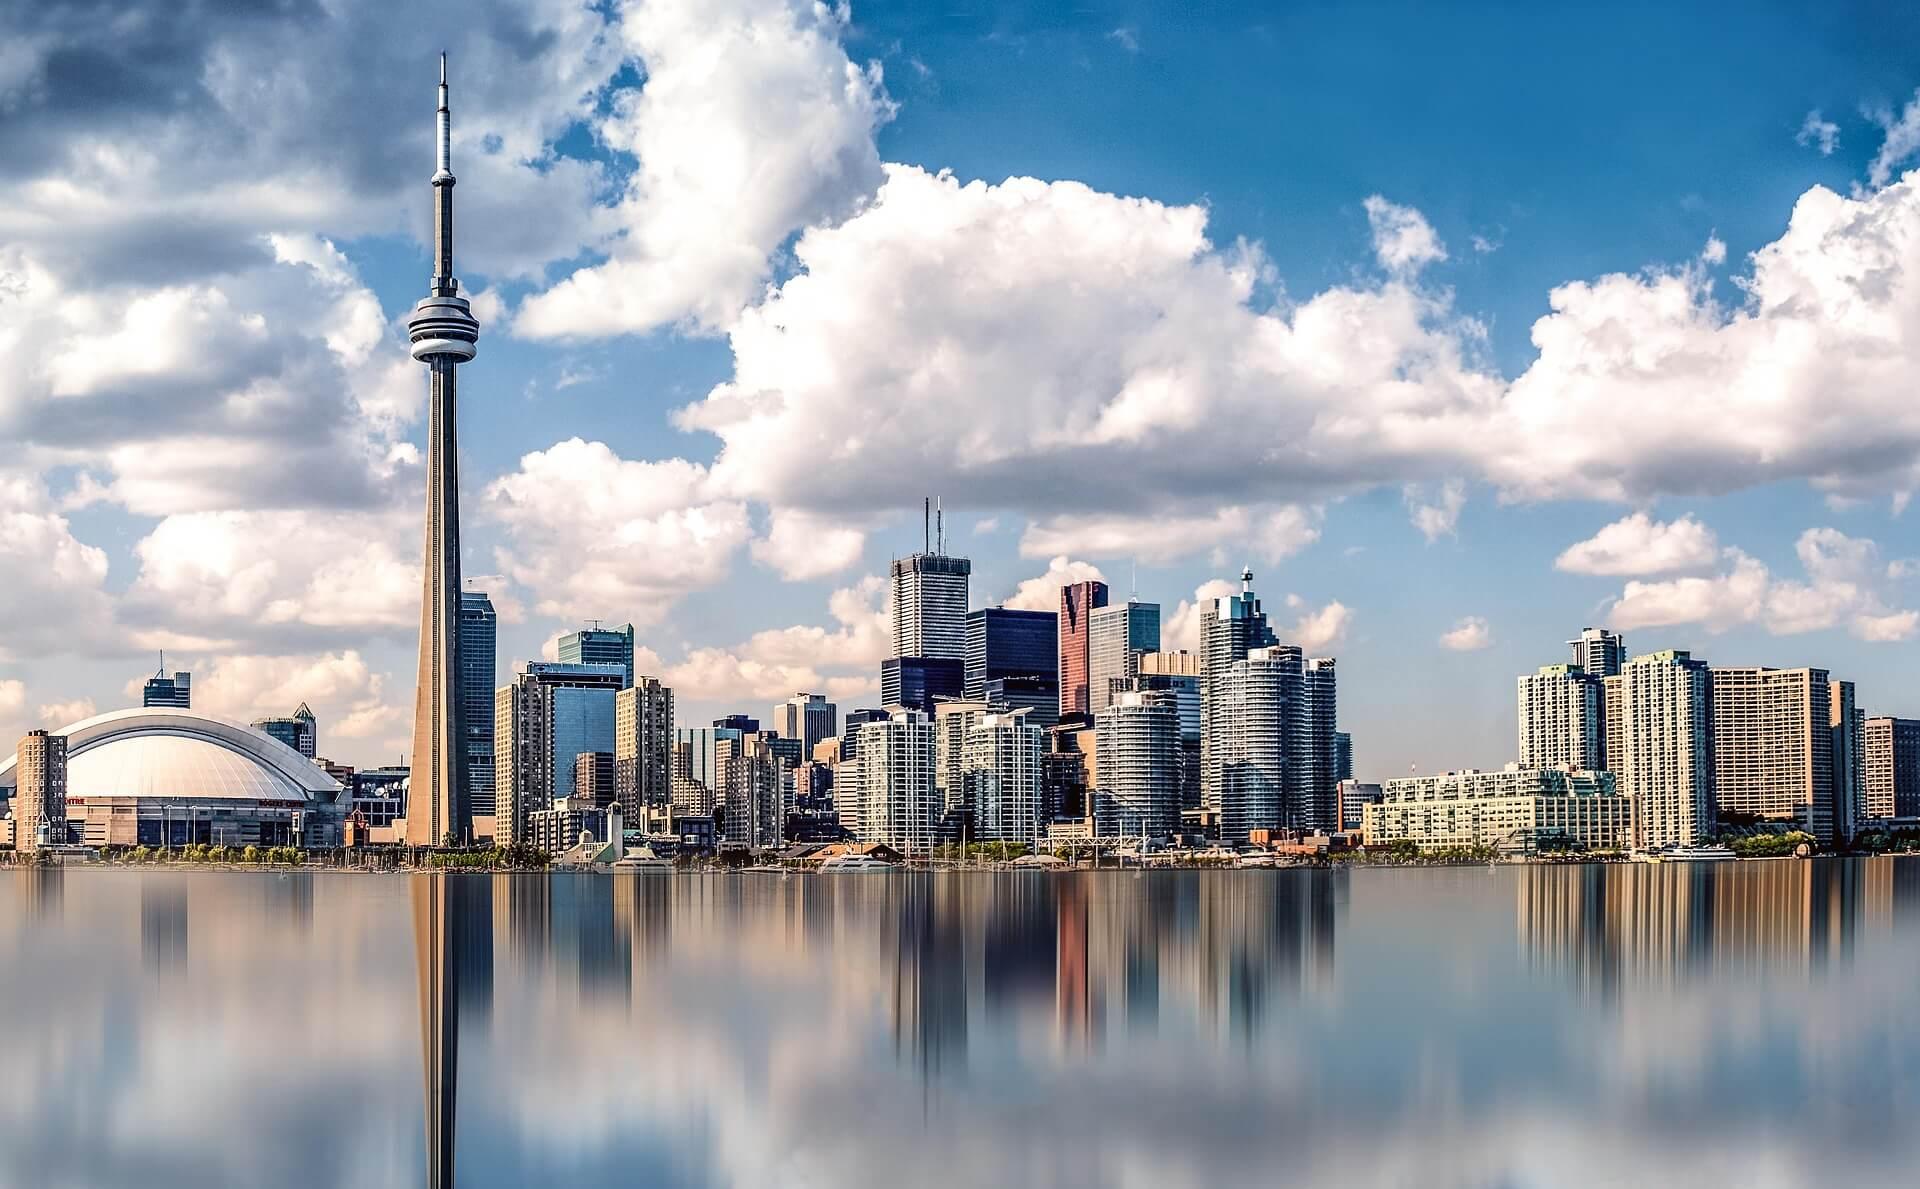 A landscape shot of Toronto, Canada's skyline